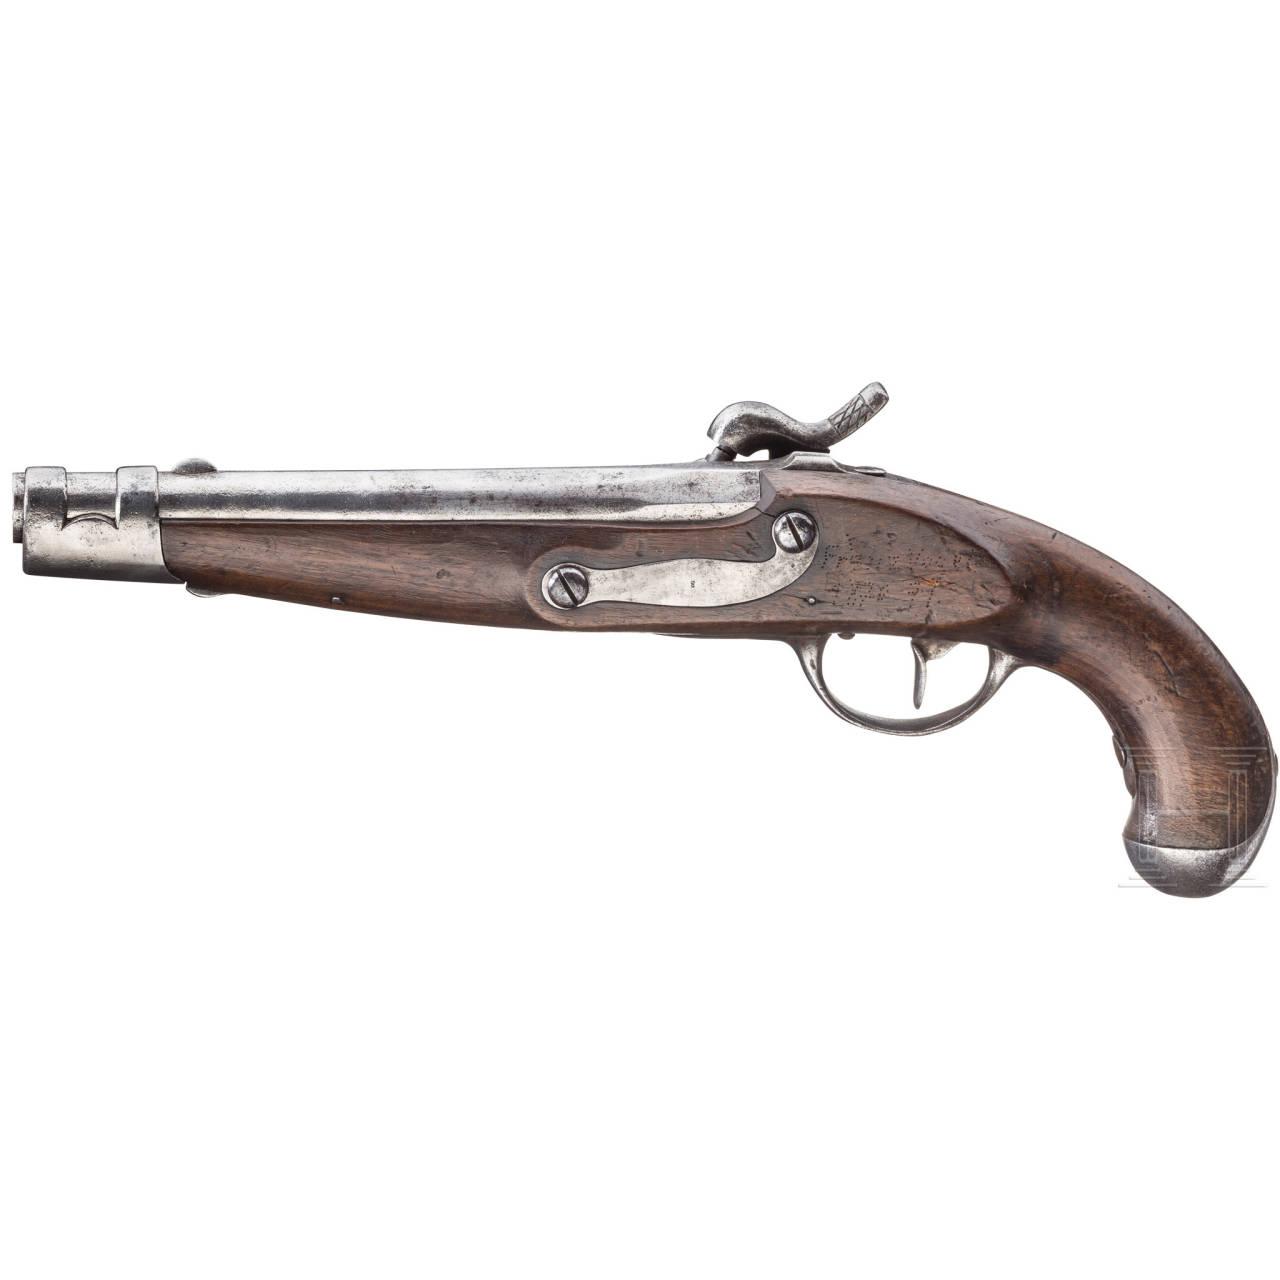 Kavalleriepistole M 1826/43